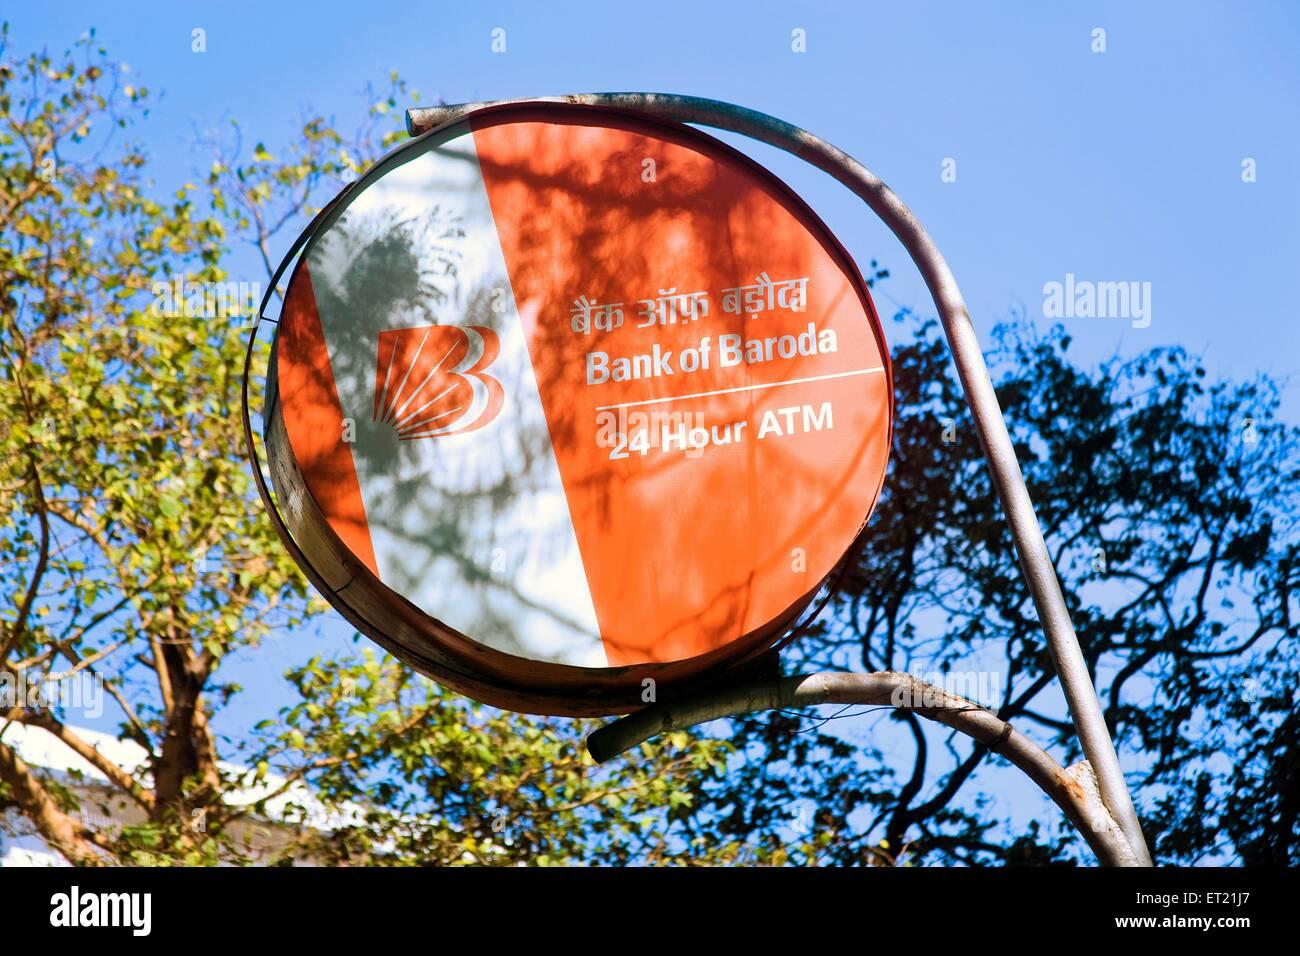 Signboard Mumbai Maharashtra India Asia Feb 2011 - Stock Image